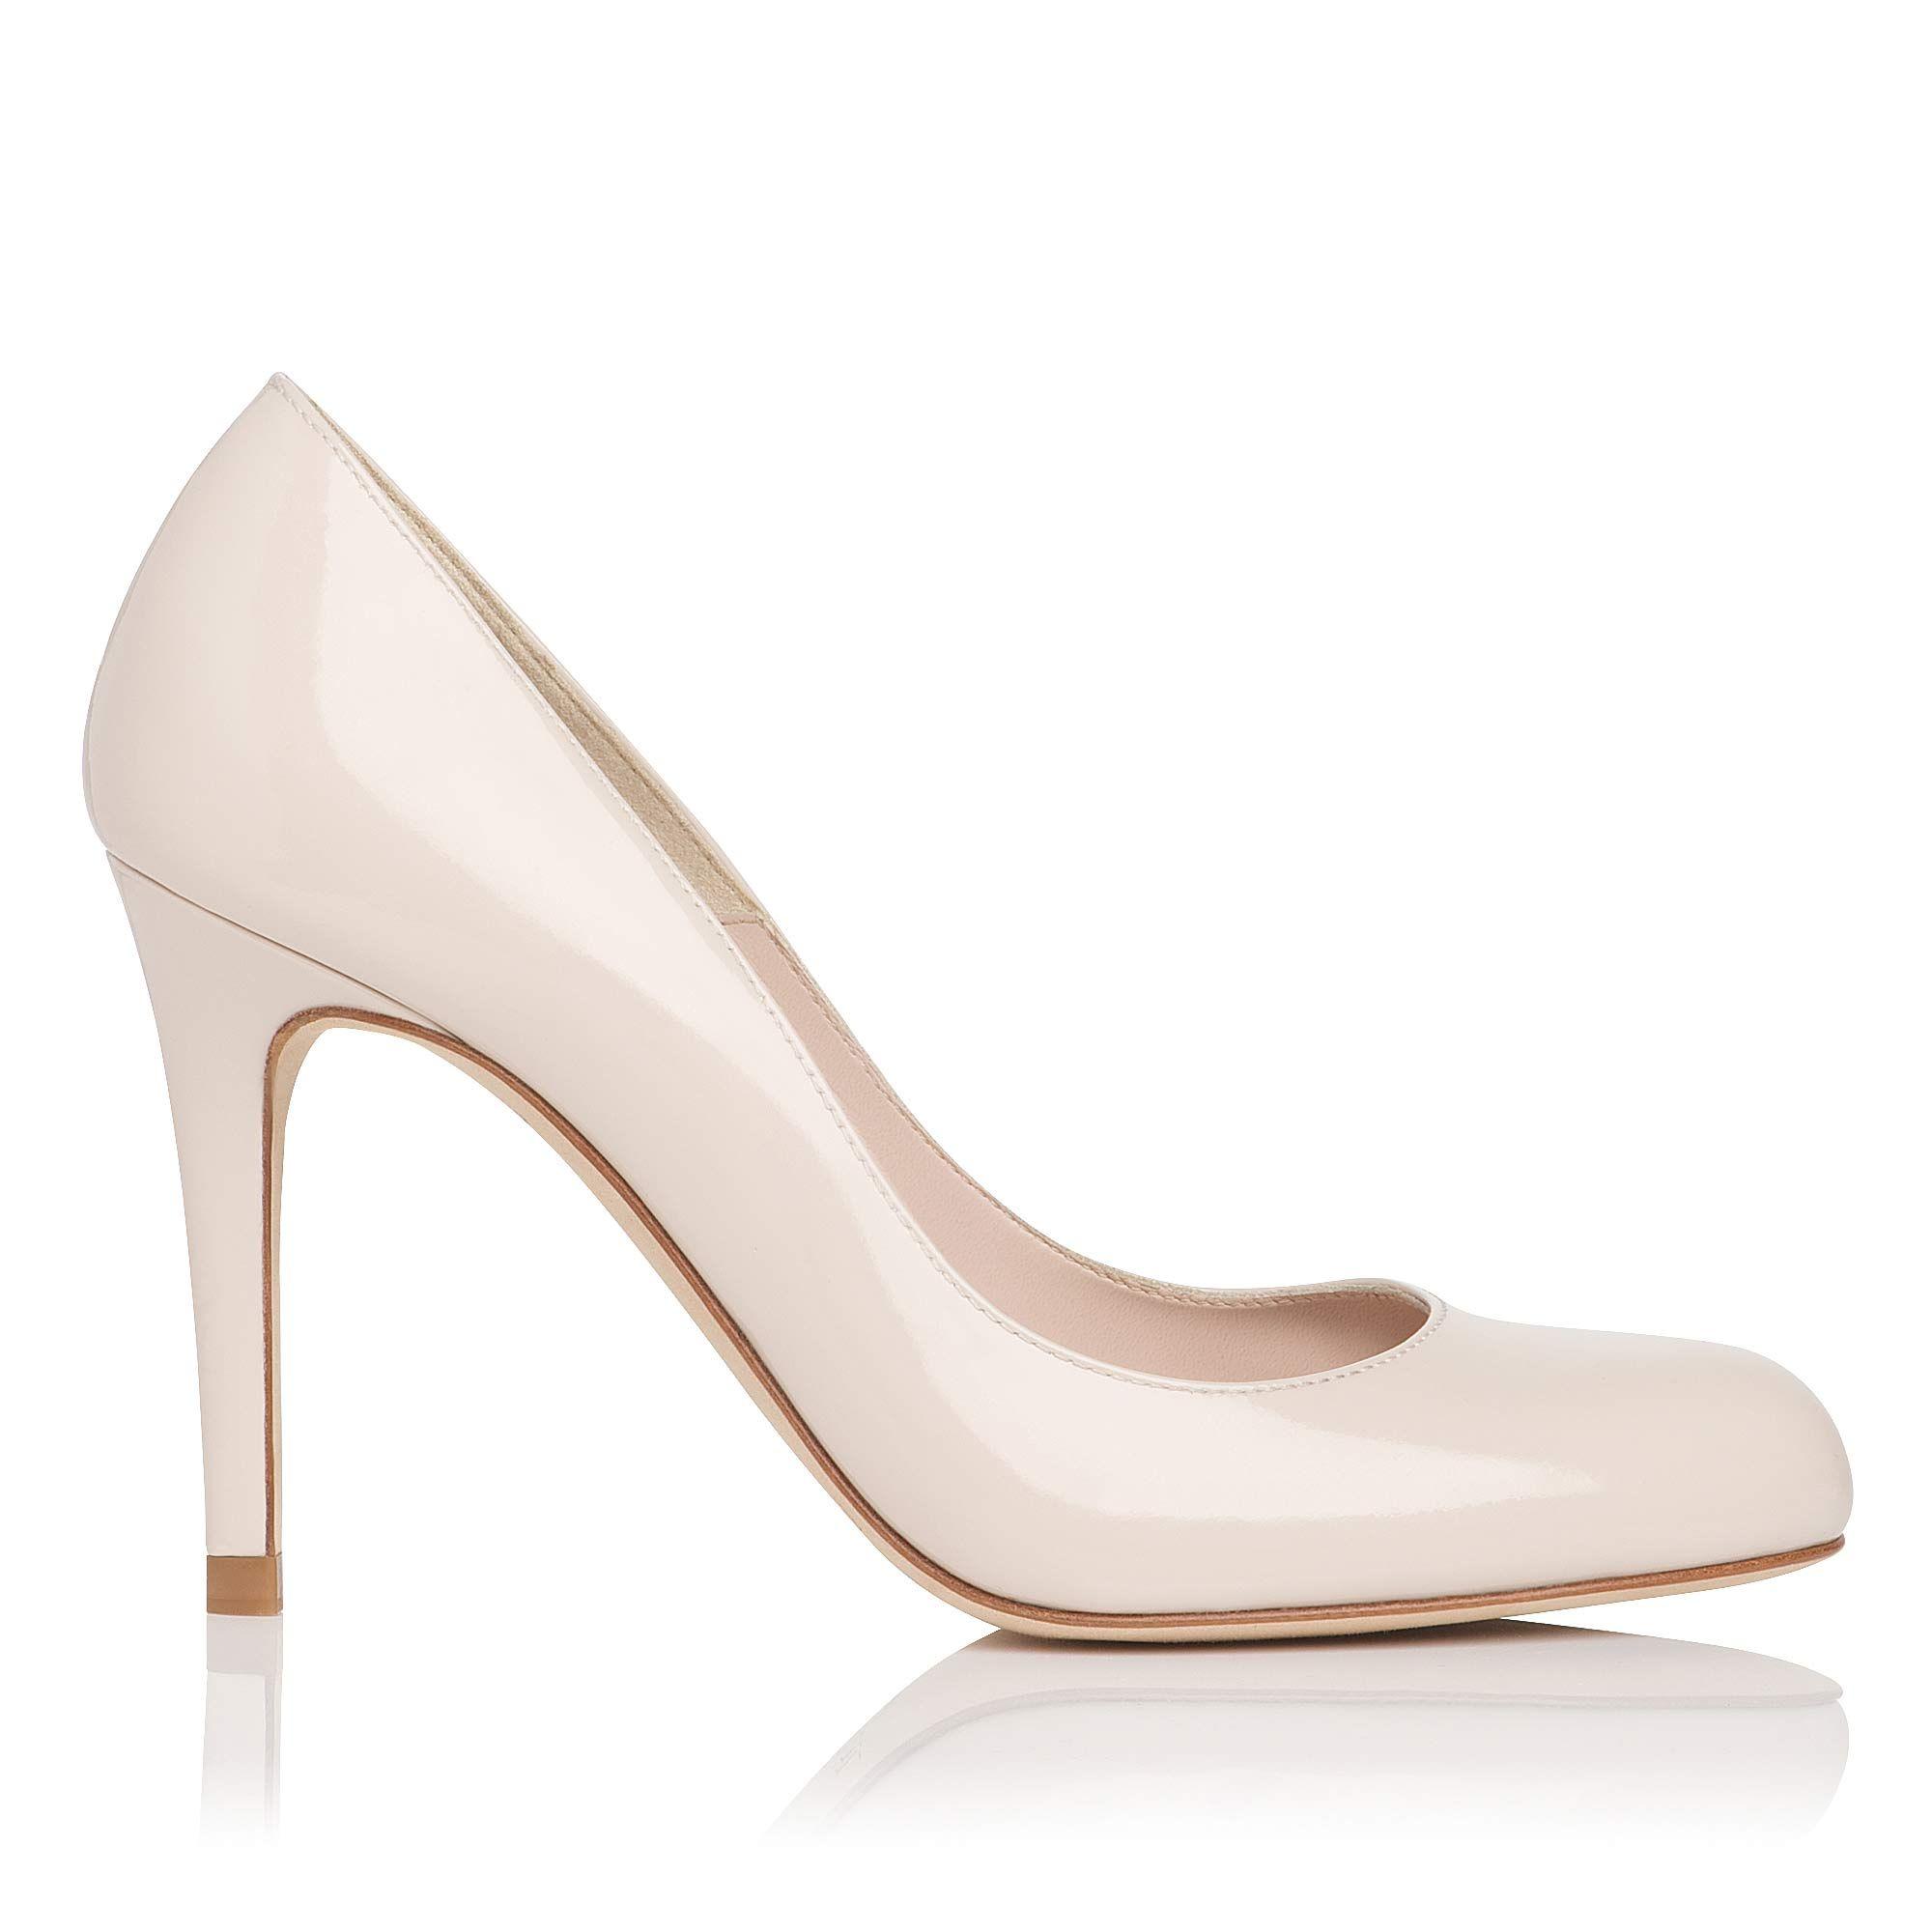 Shilo Patent Leather Court Shoe Off White LKBennett